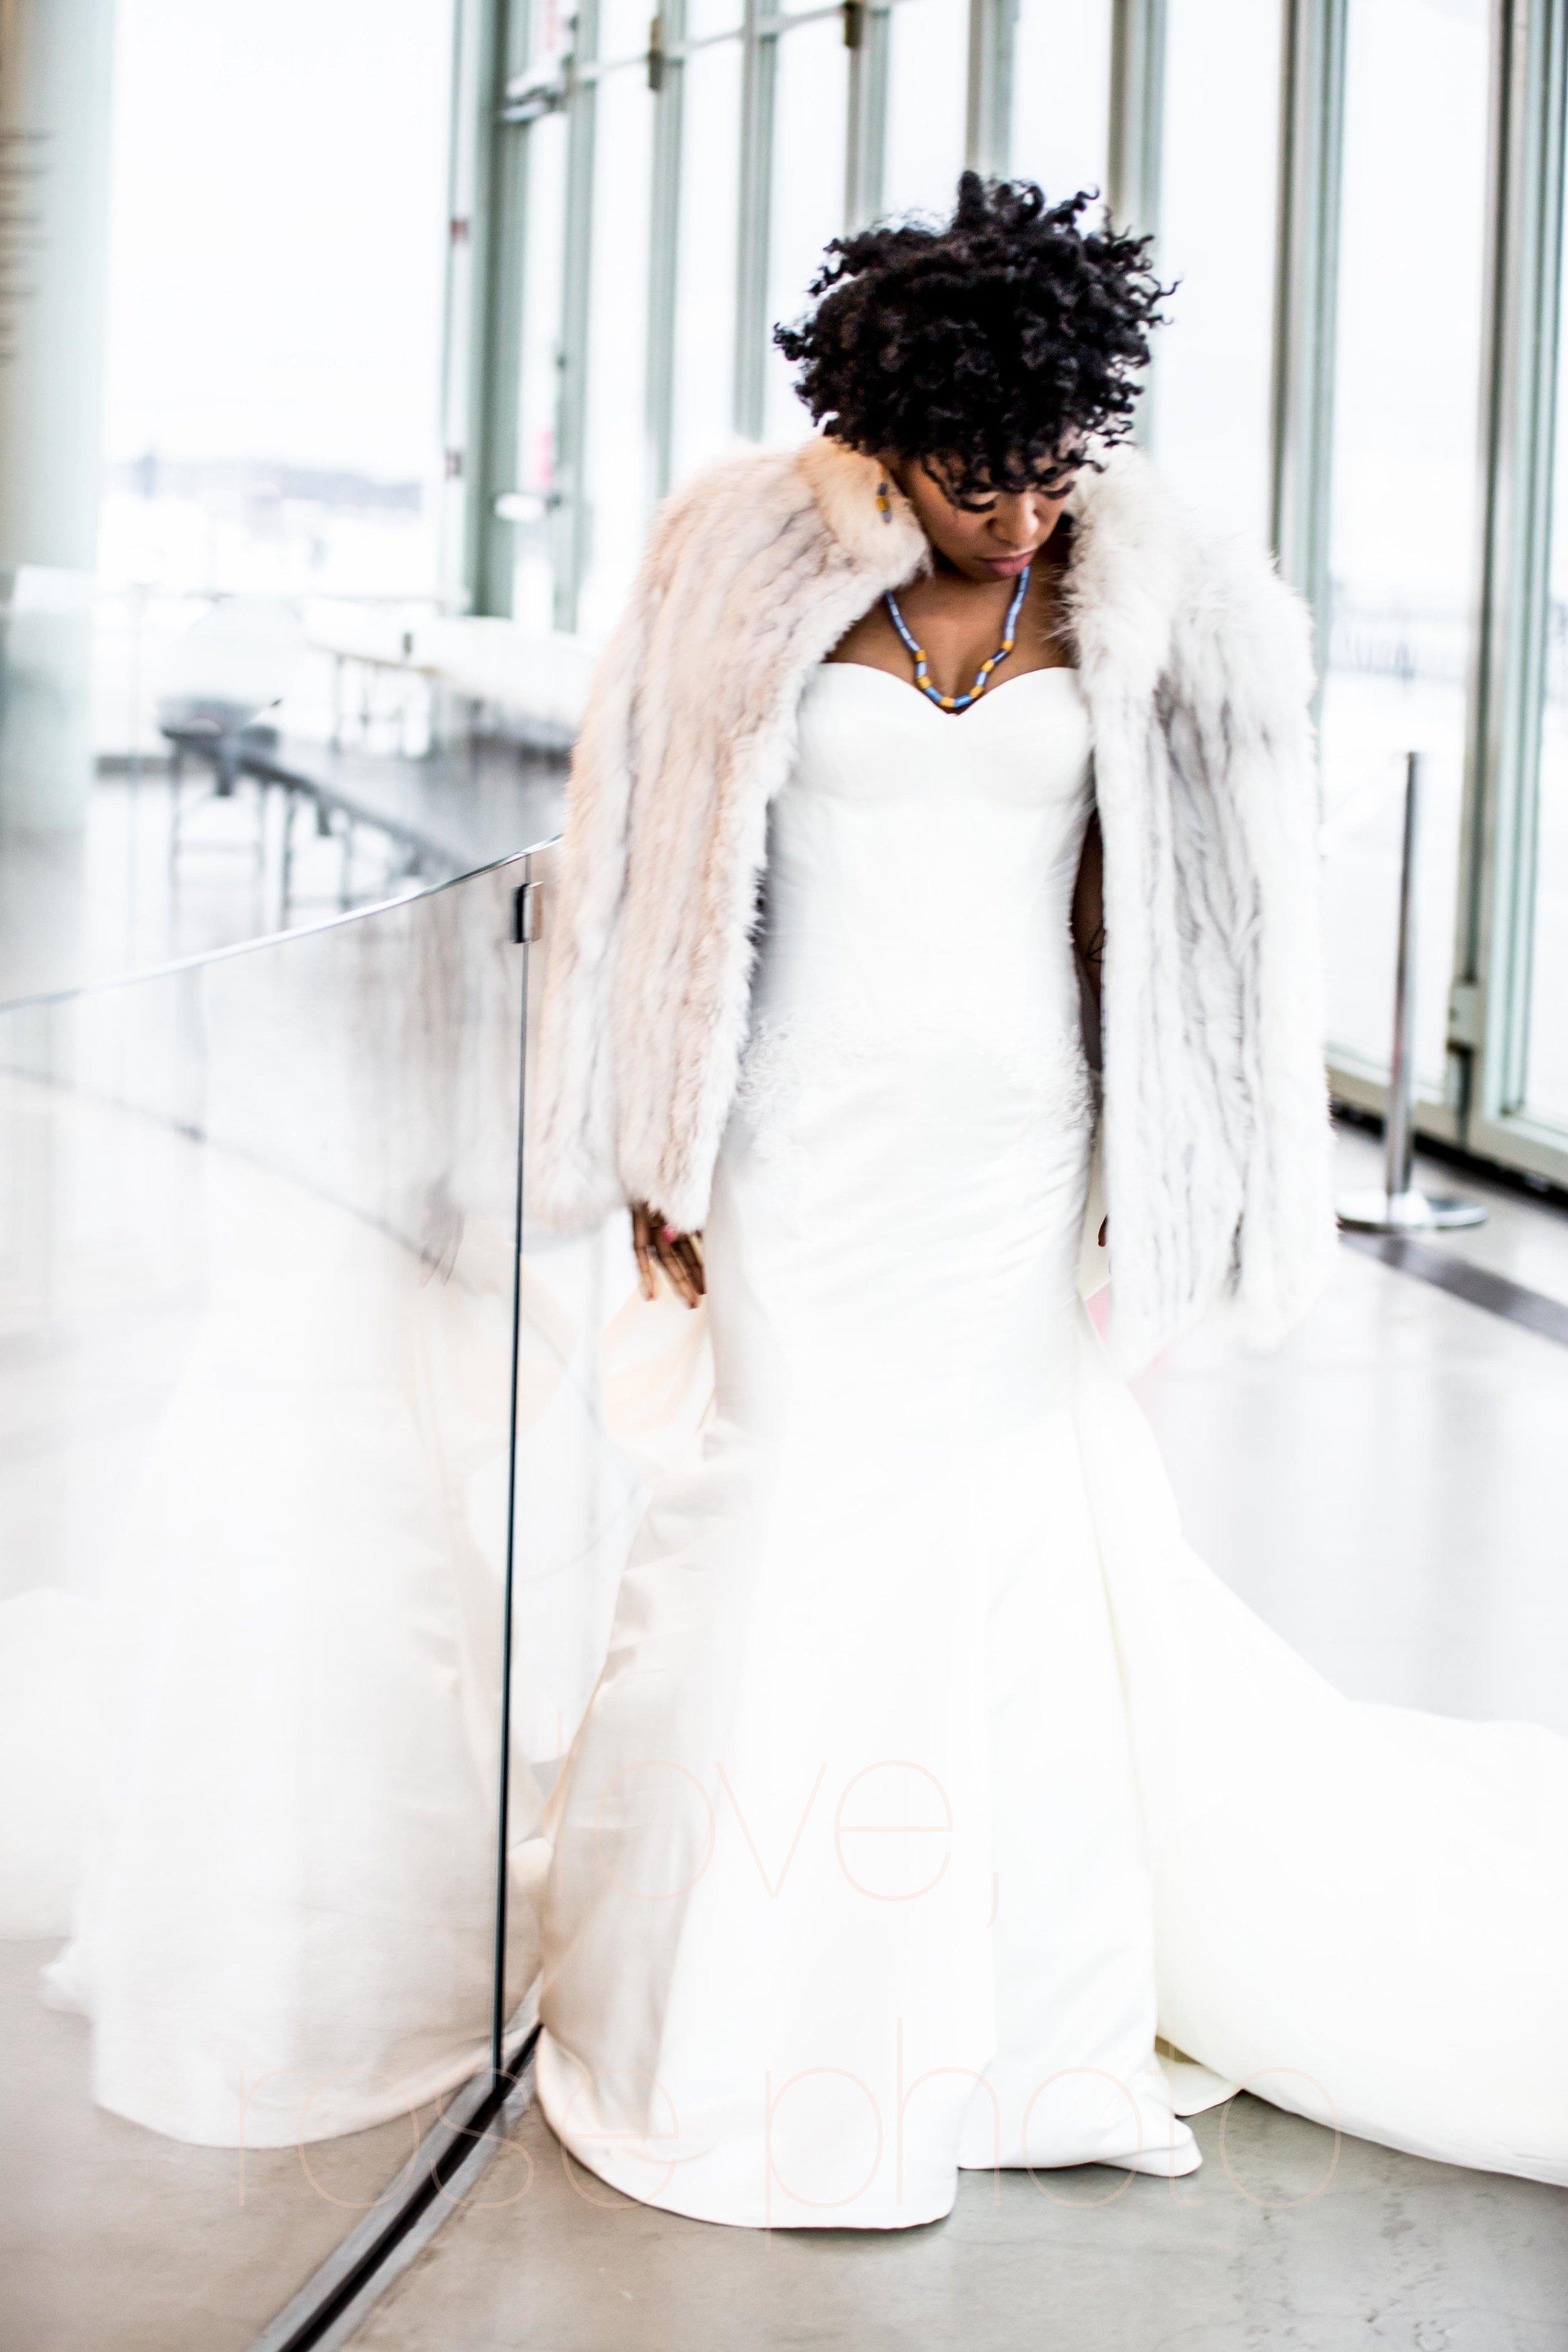 BRACEY rose photo chicago nyc wedding photographer asheville-26.jpg